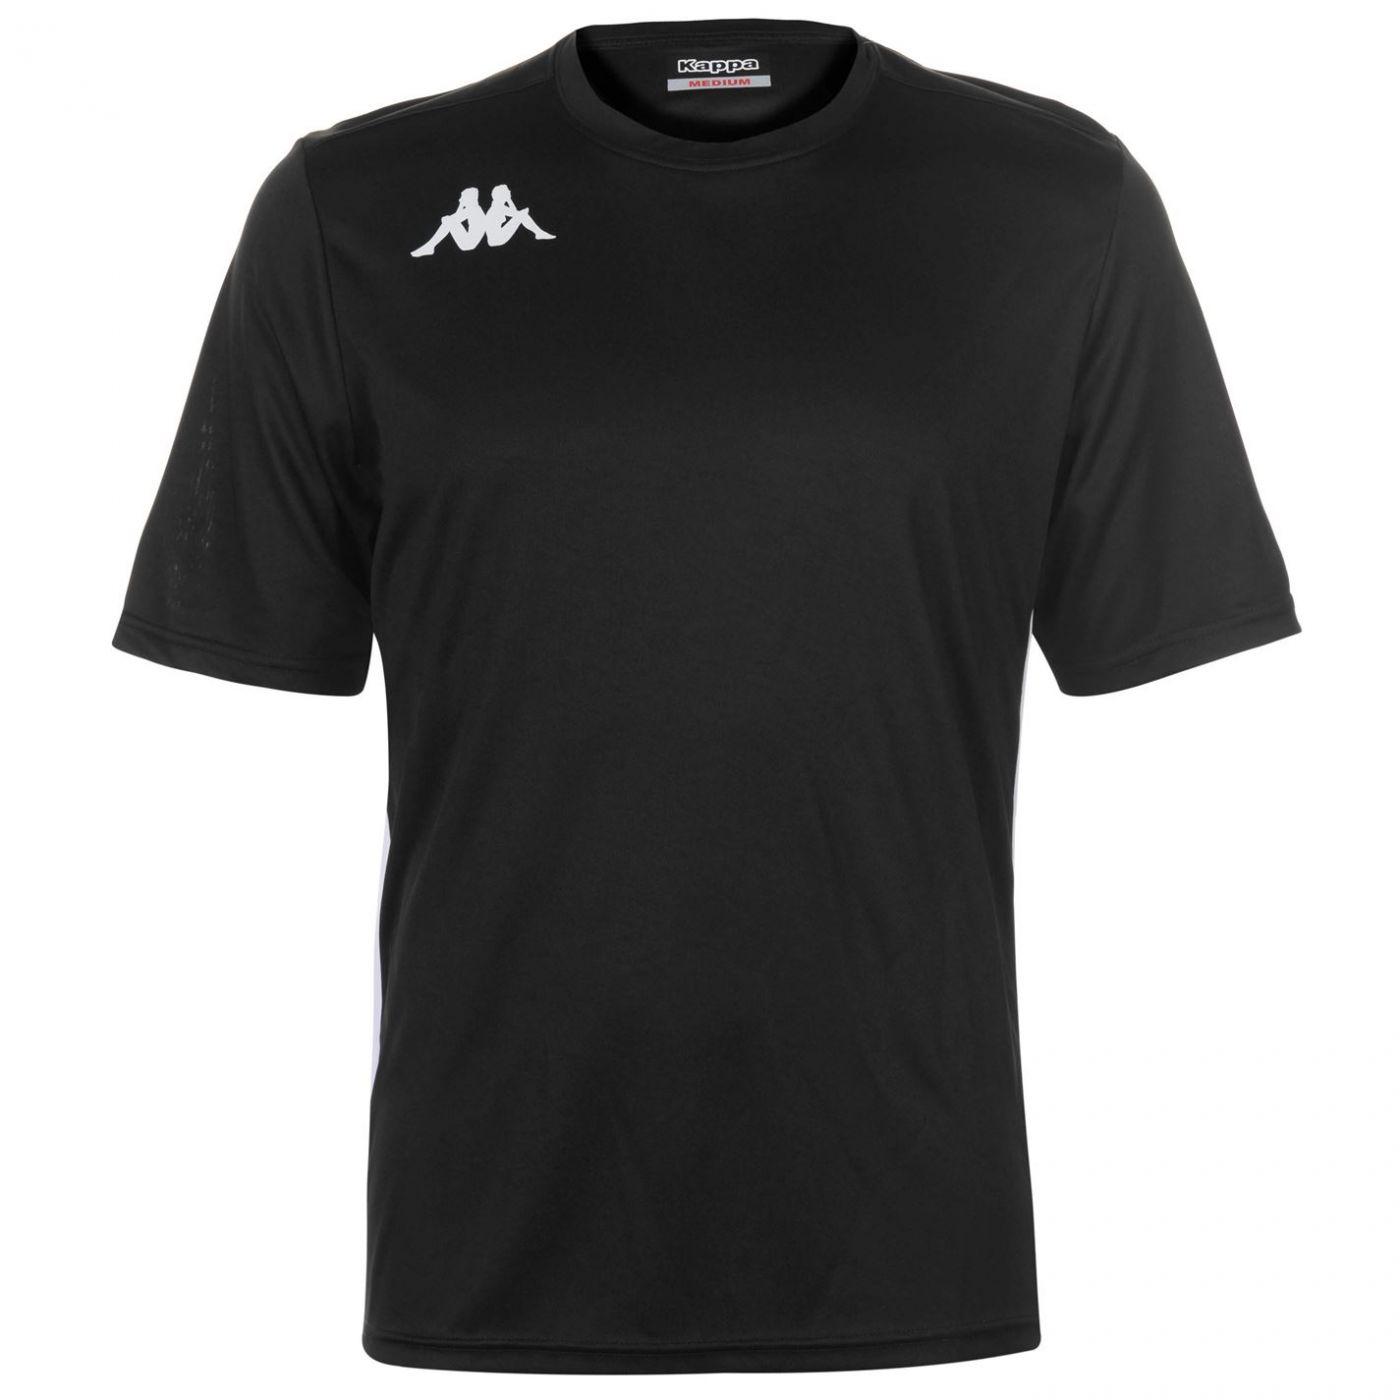 632a61922637 Kappa Torino Short Sleeve T Shirt Mens - FACTCOOL